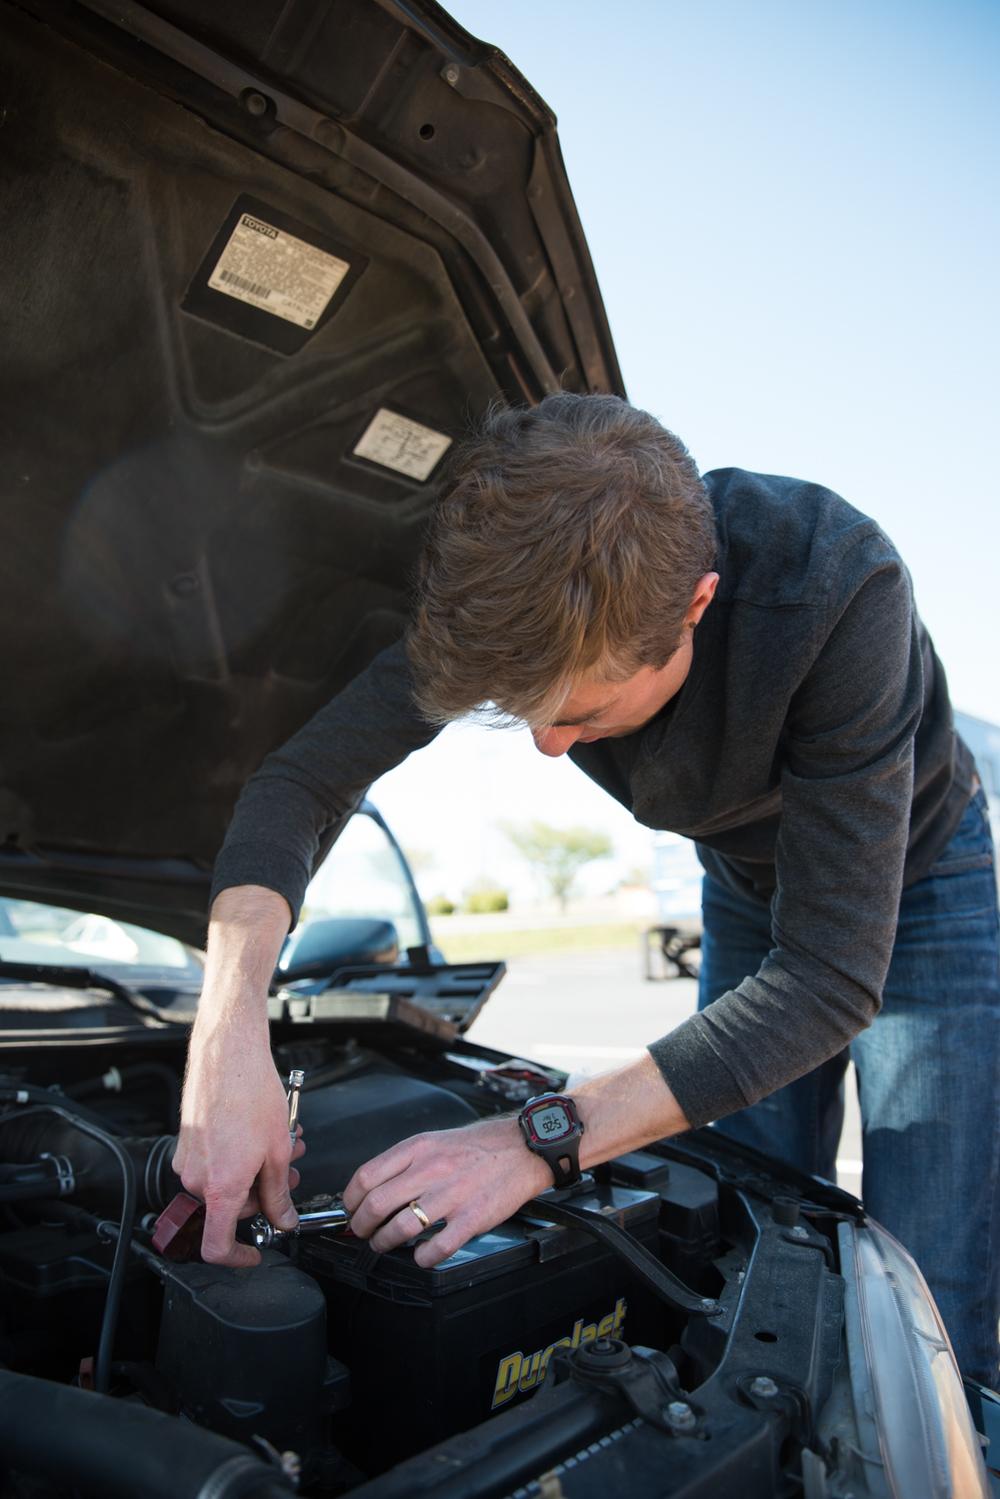 Man replaces dead battery in broken down car